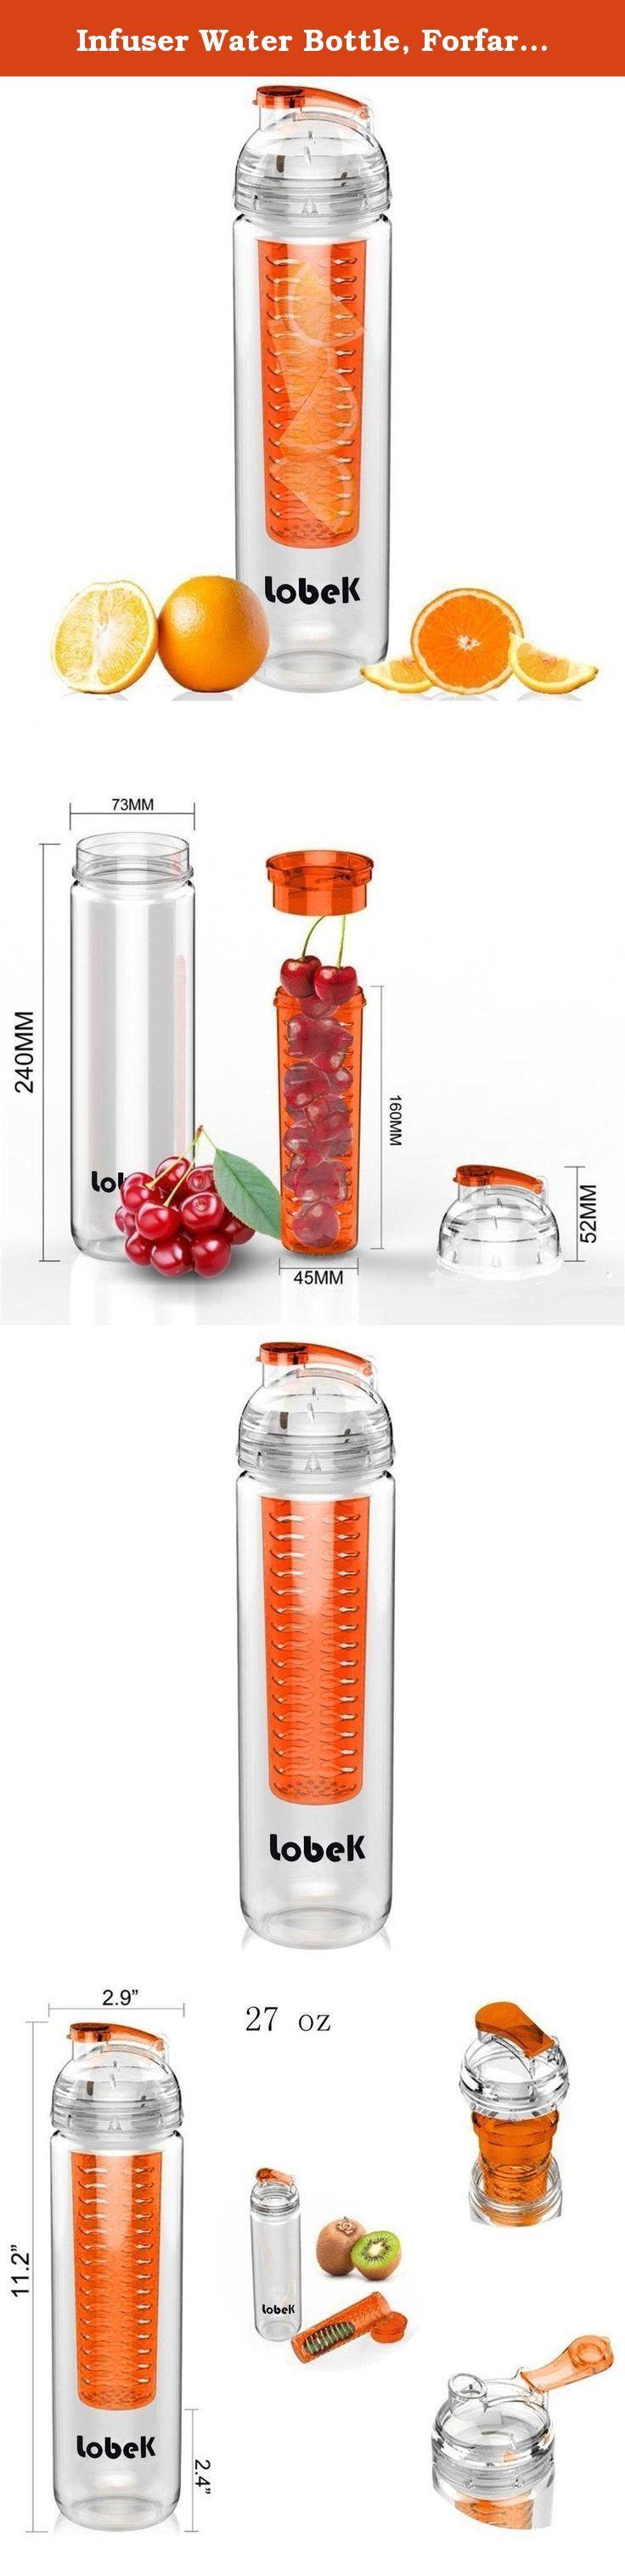 Infuser Water Bottle, Forfar Lobek Sport Flip-Top Fruit Bottle, BPA-Free Tritan 27 oz (Orange), Perfect for Running, Camping, Yoga, Hiking. Specifications: Product: Lobek Water Bottle Model: SB-T01 Material: Tritan(100% BPA-Free) Color: Orange Capacity: 27oz / 800ml. Product Dimensions: 7.3 x 7.3 x 28 cm. Package List: 1 * Lobek 800ml Tritan Water Bottle 1 * Original Package Box How to Make Flavored Water 1. Select fruit you like. Choose your favorite fruit. Fresh fruit in season has the...